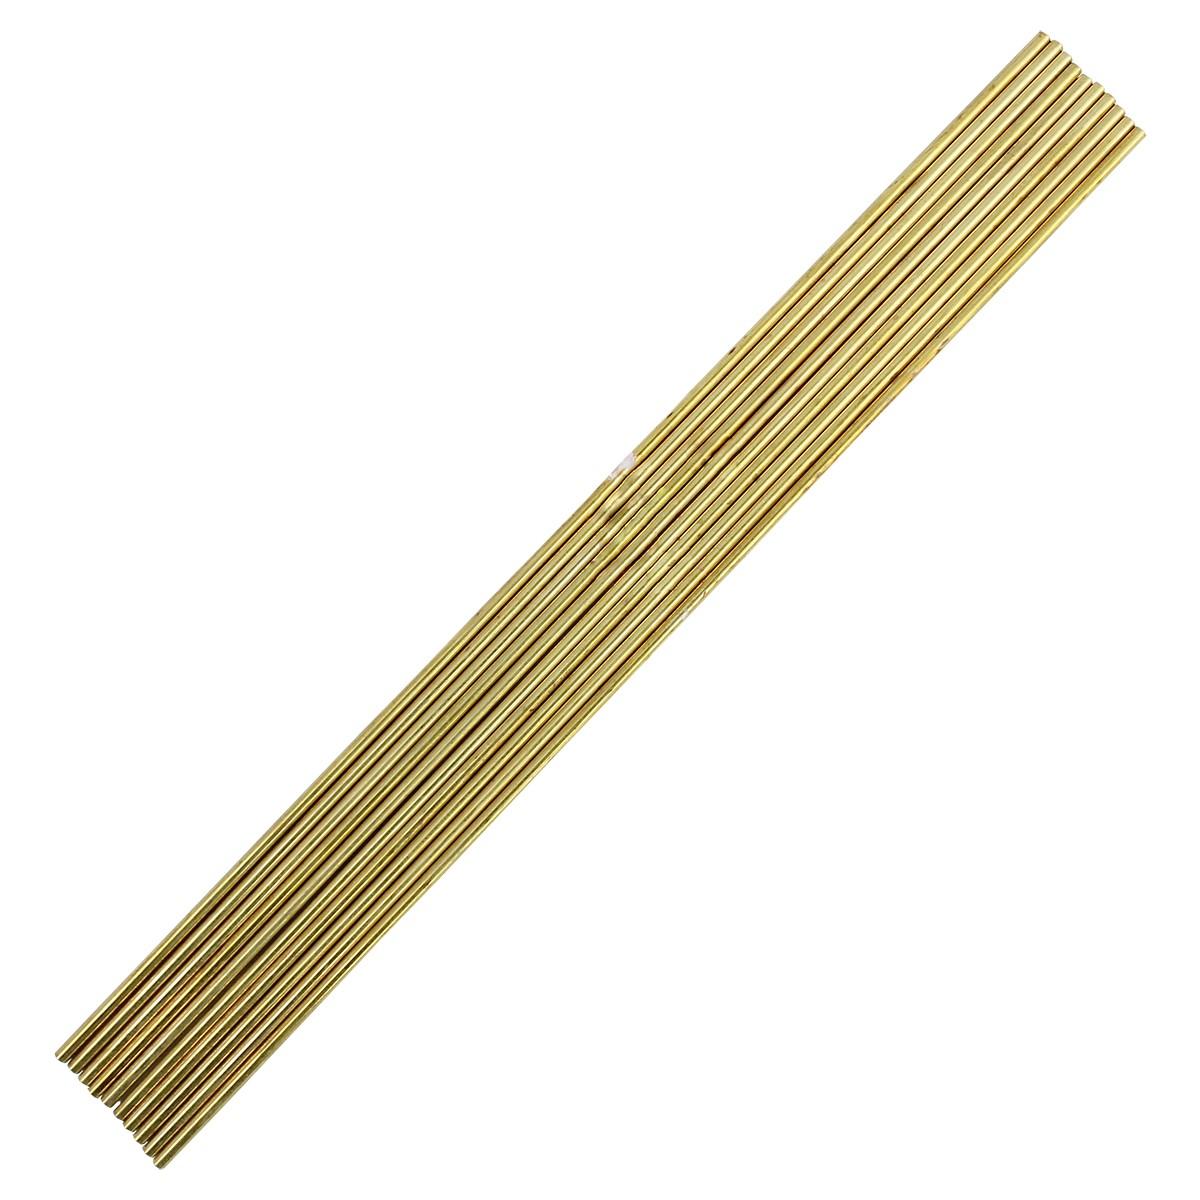 Brass Sprue Rods